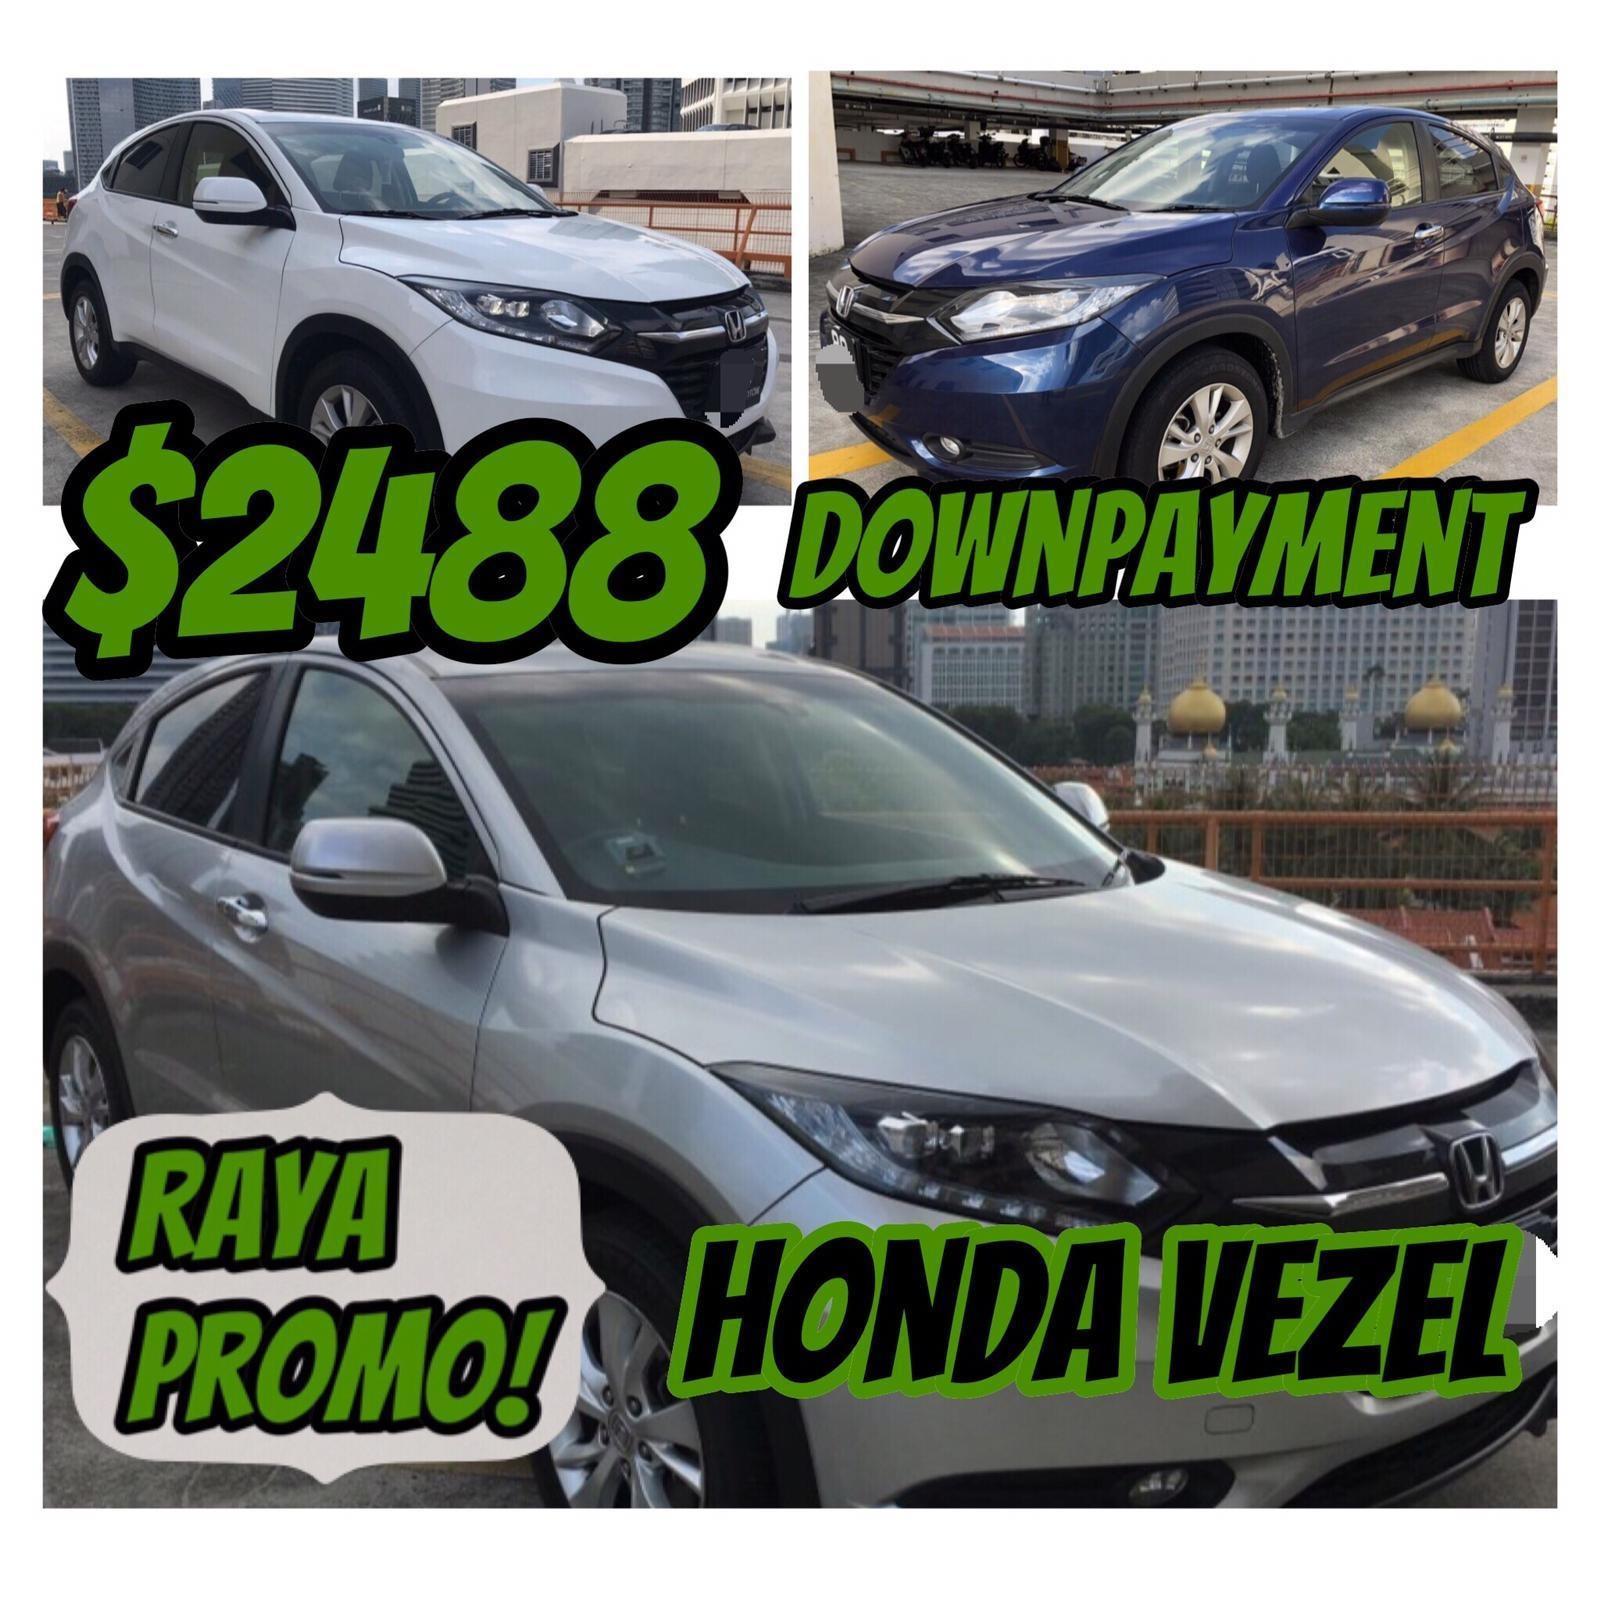 Honda HONDA VEZEL